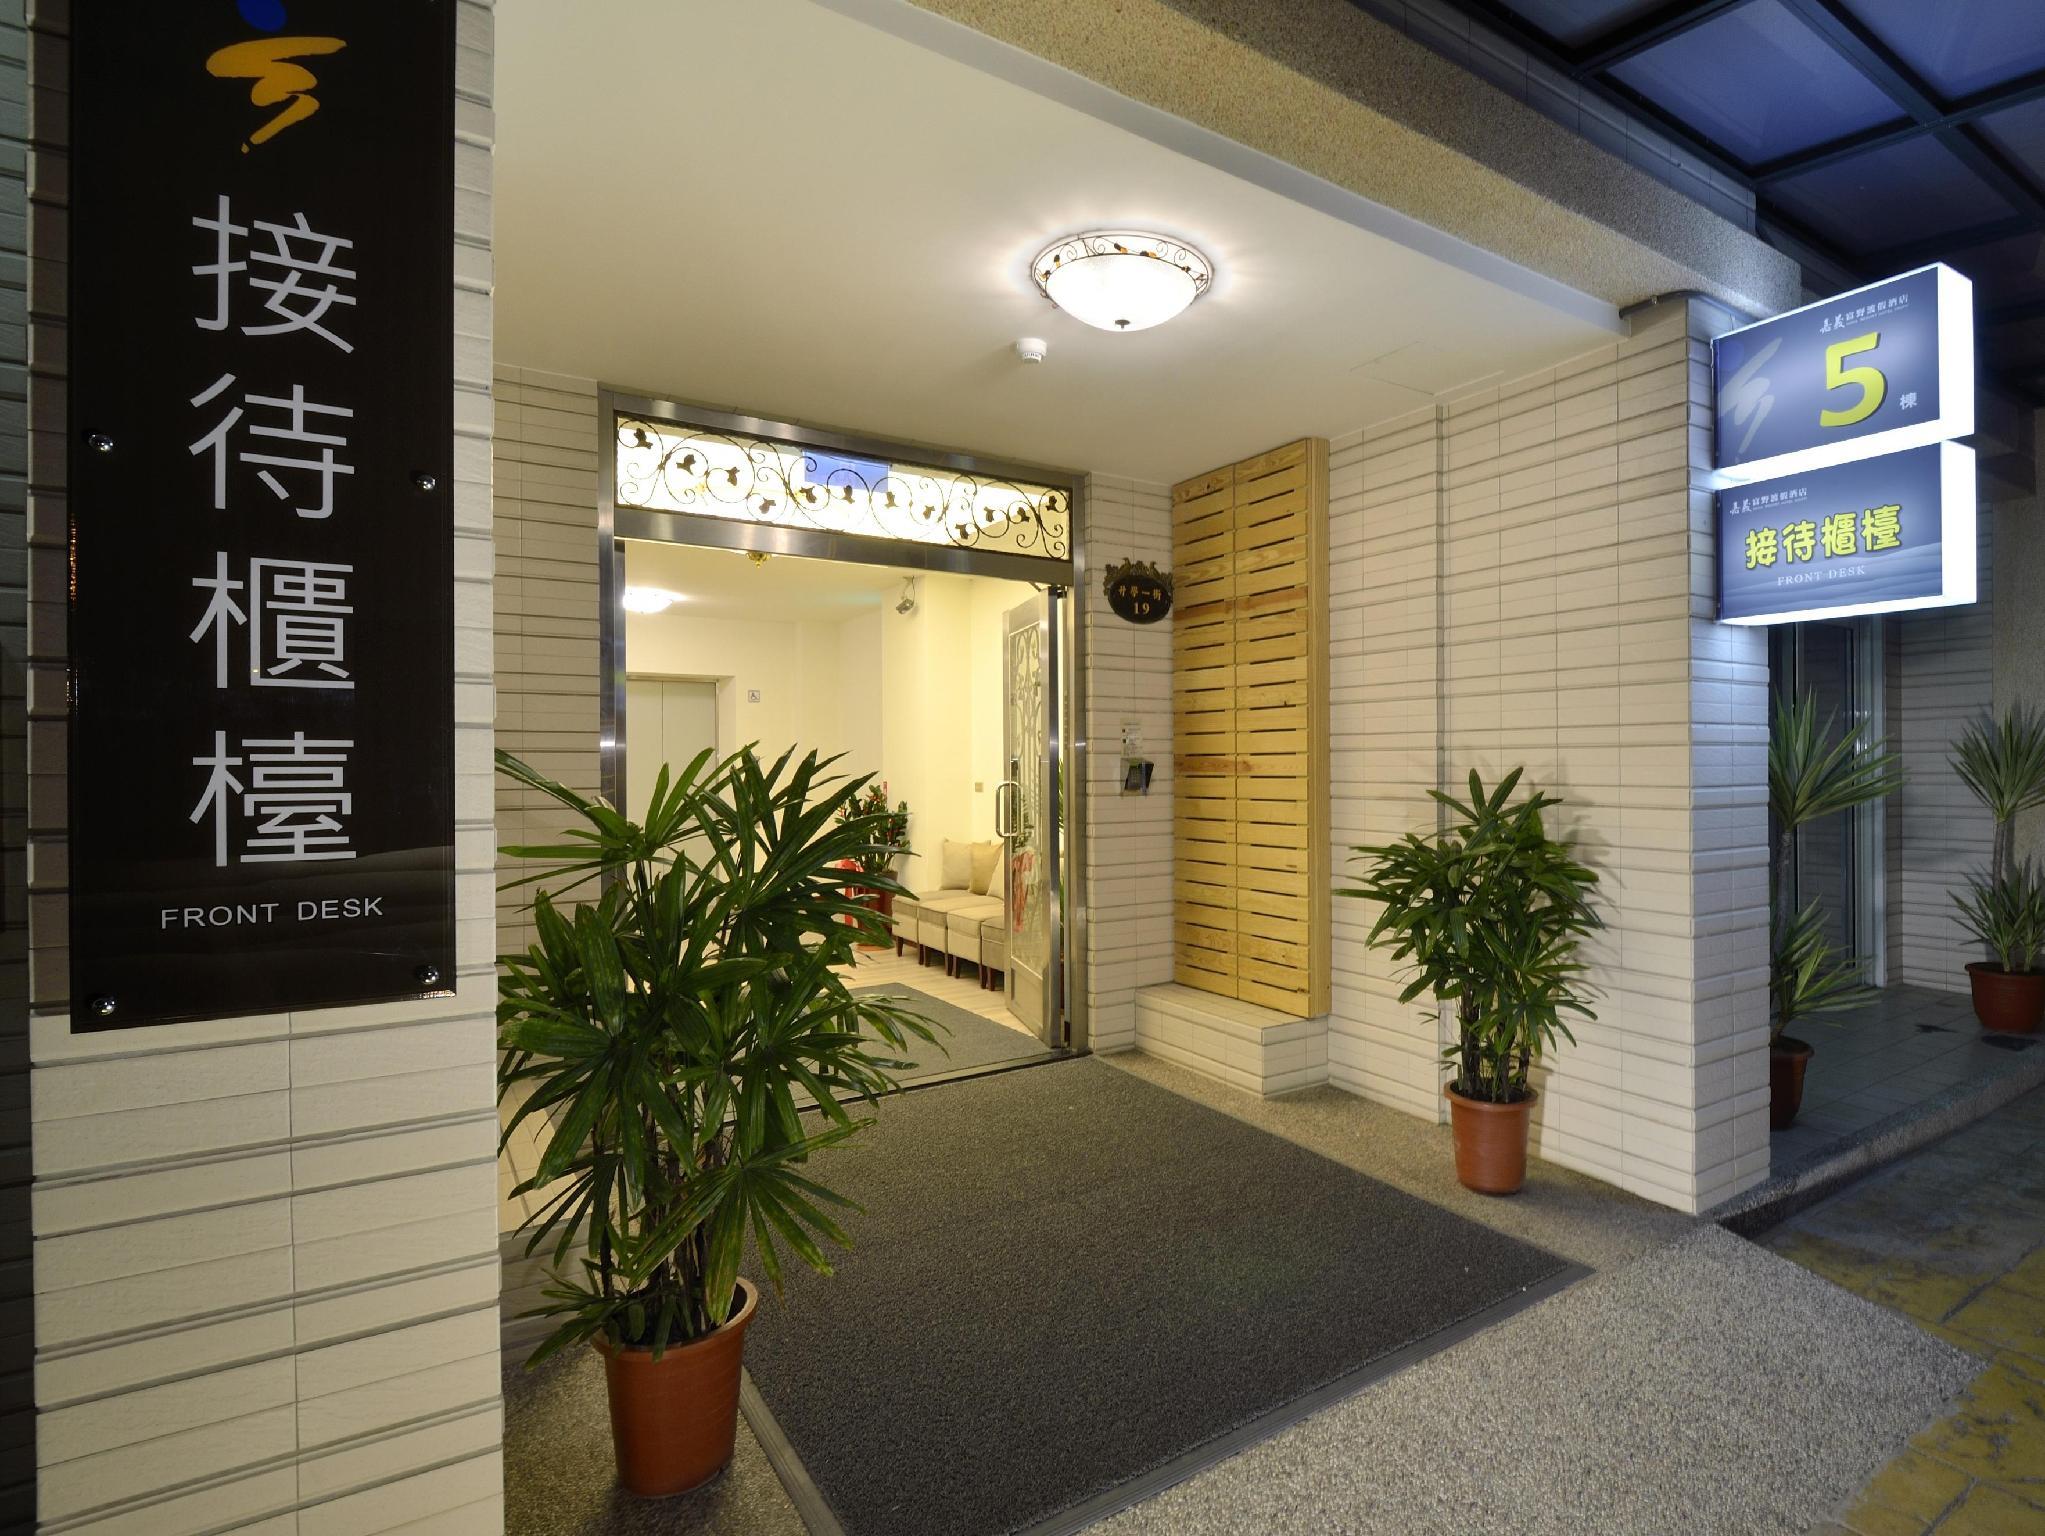 嘉義縣嘉義富野渡假酒店 (Hoya Resort Hotel Chiayi)線上訂房|Agoda.com